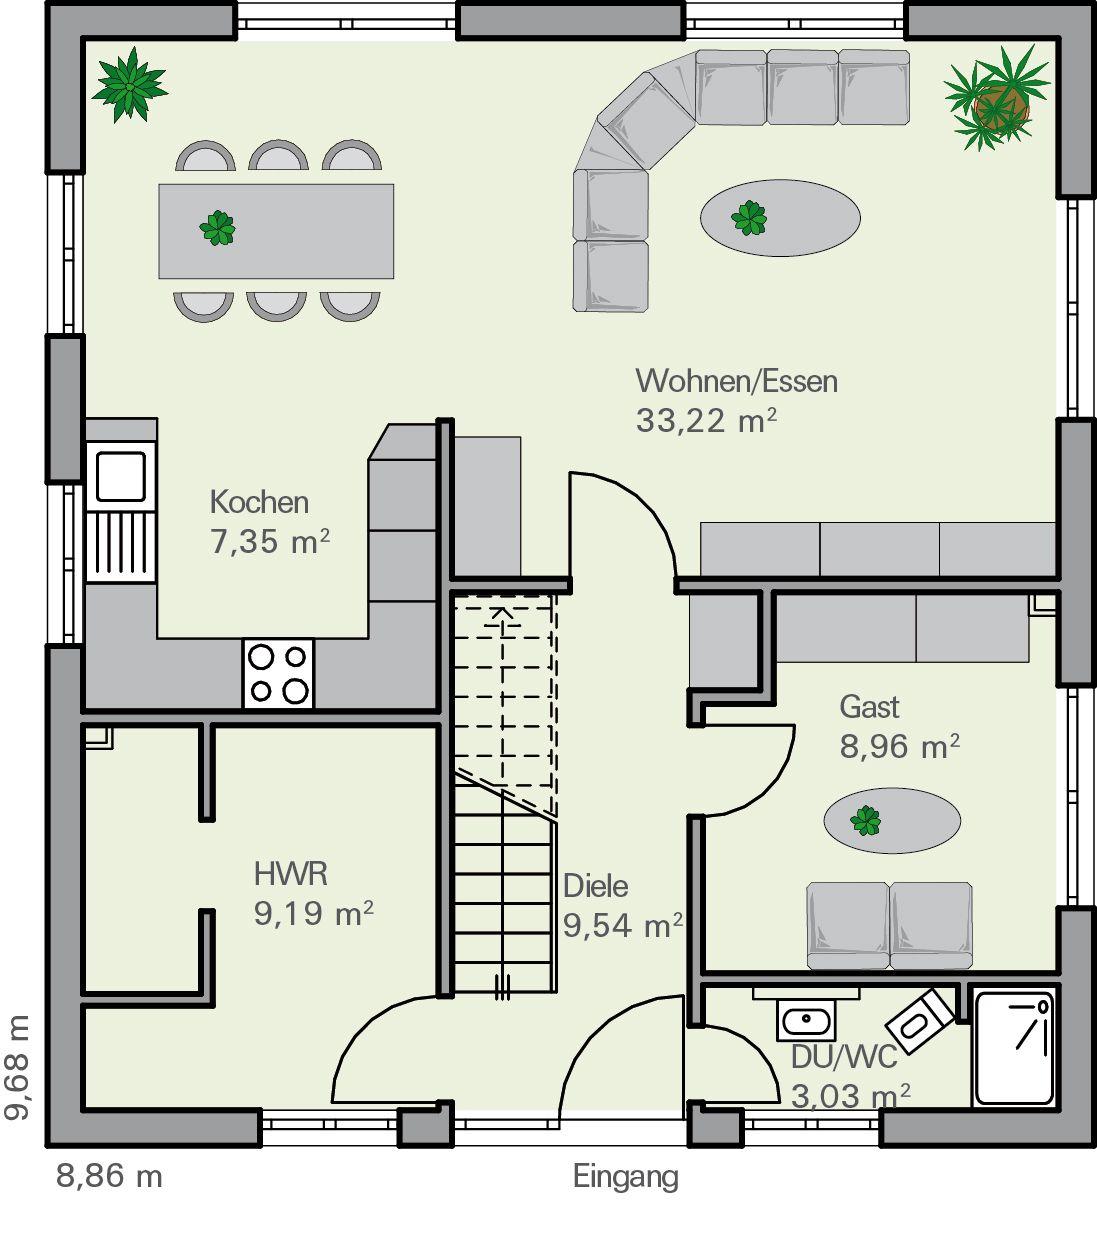 ^ 1000+ images about Grundriss infamilienhaus on Pinterest Daniel ...